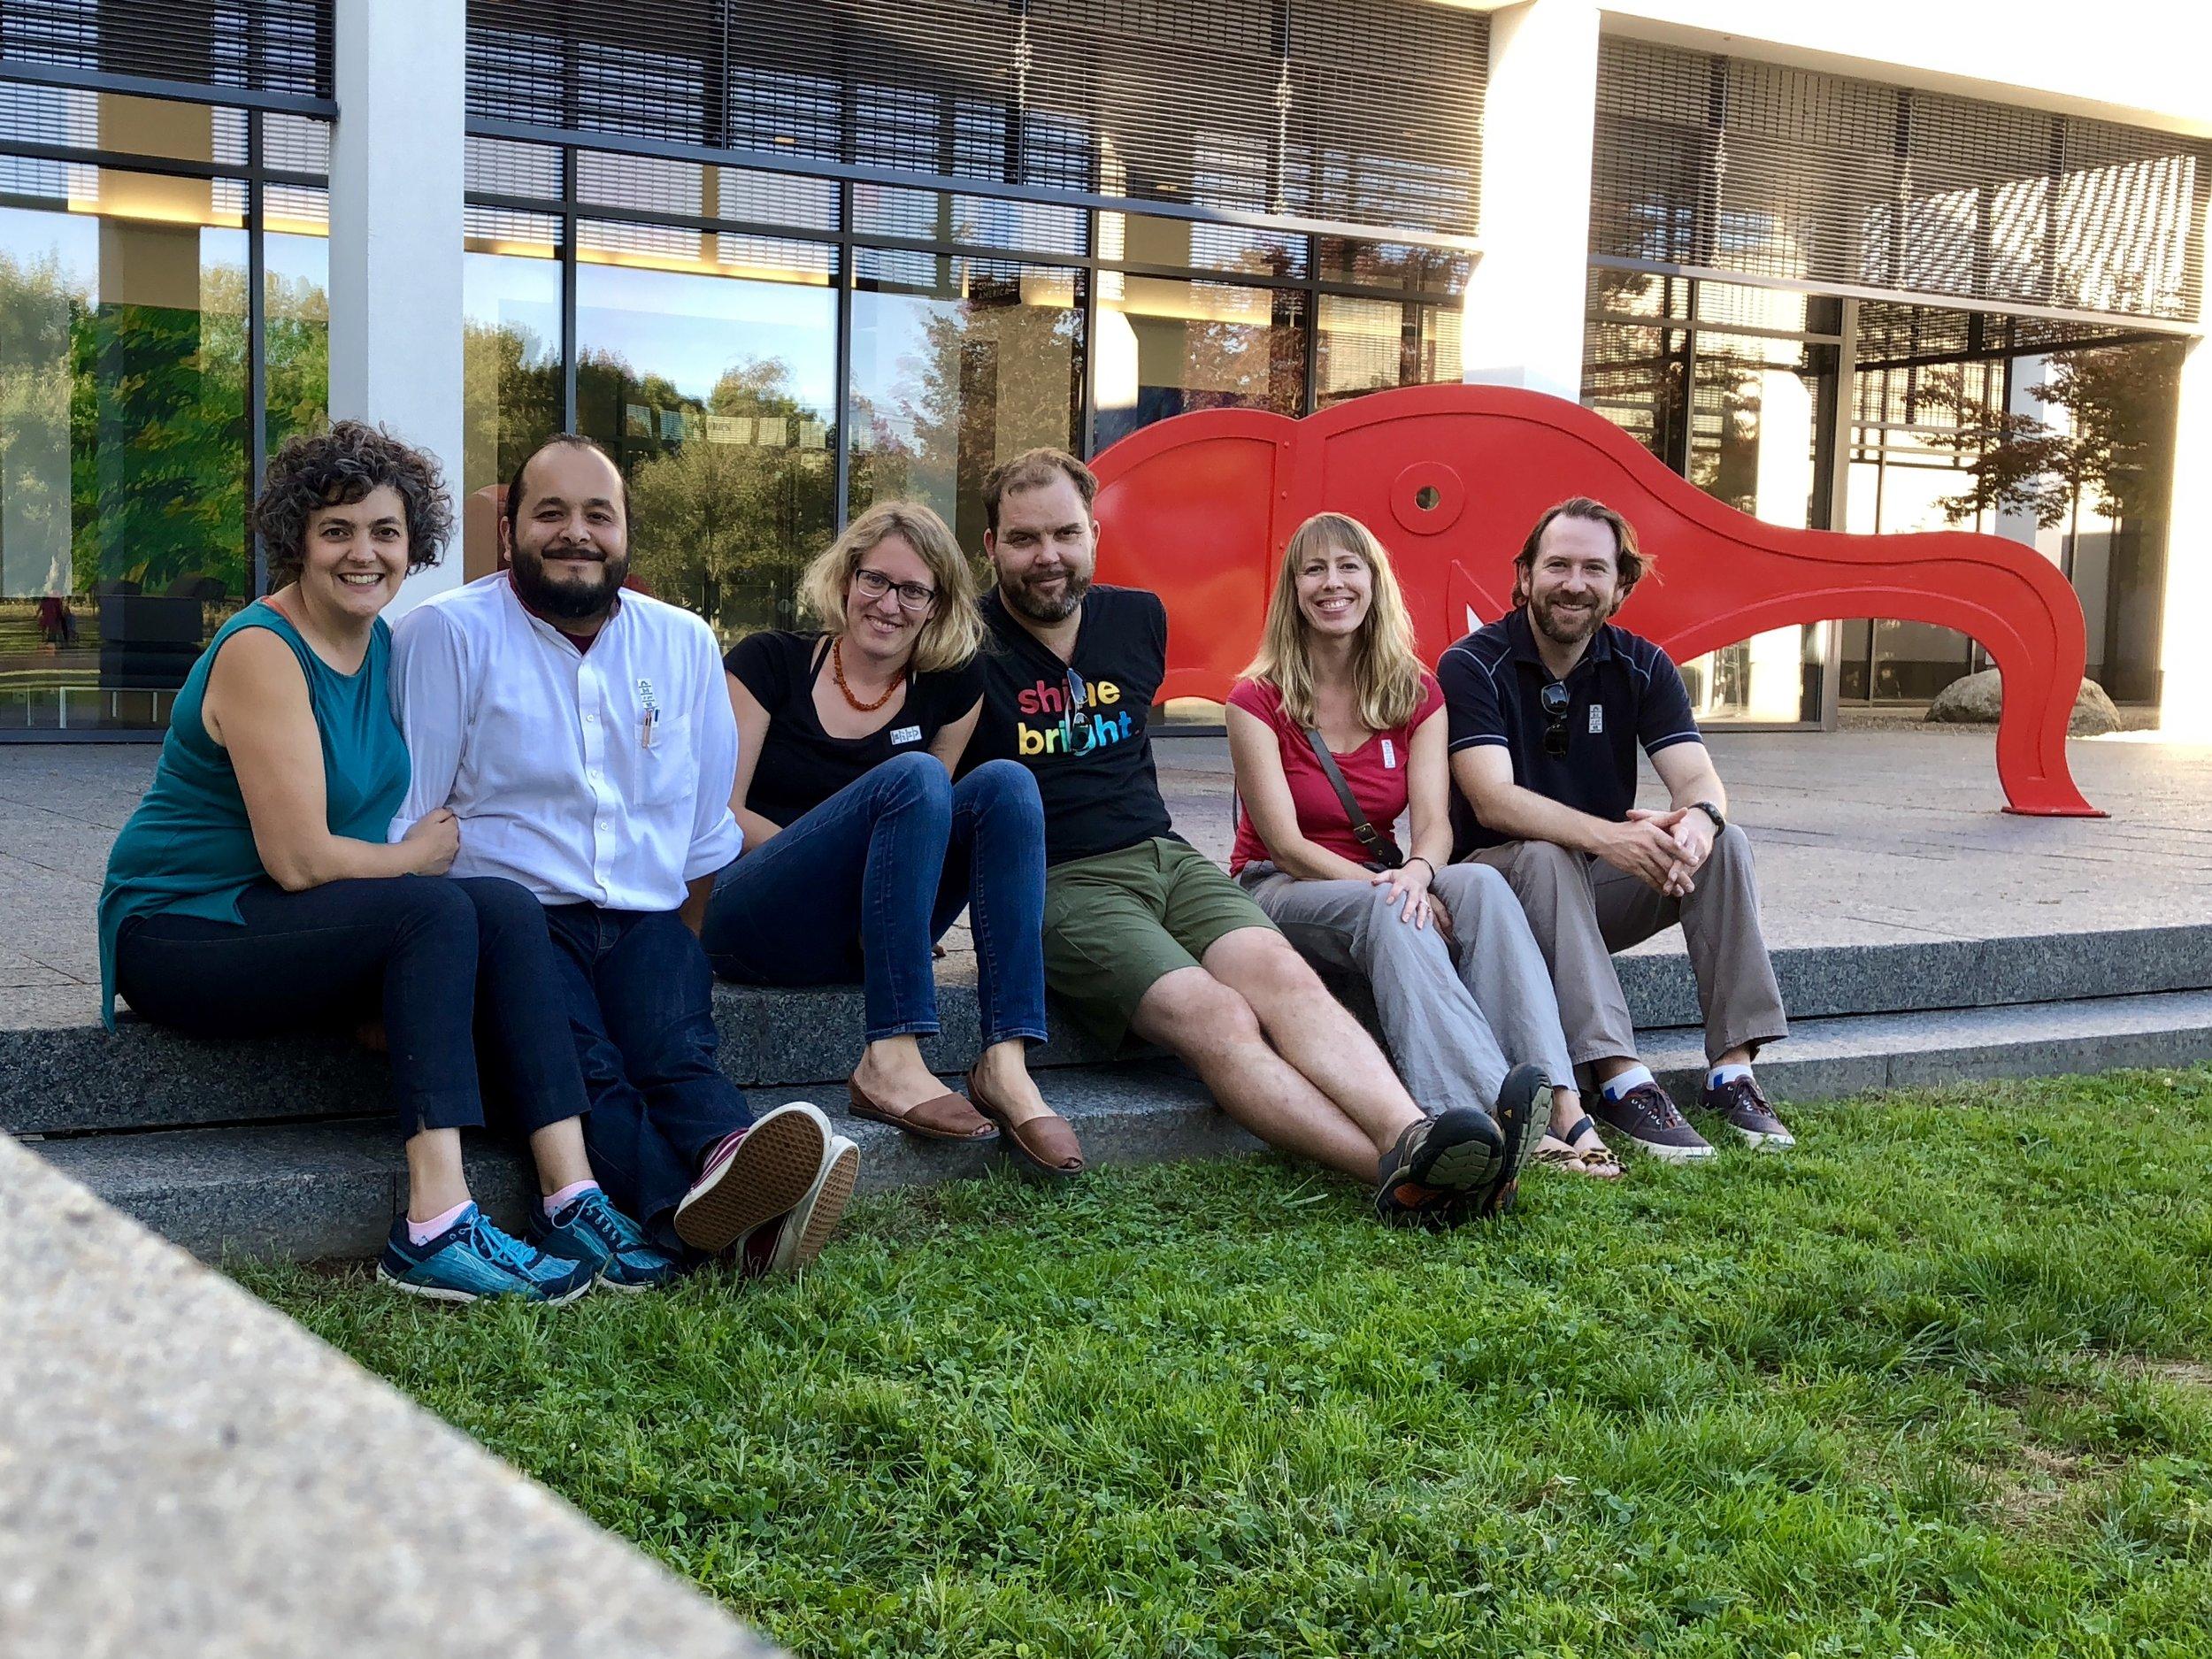 Us, Charlotte & Matthew, Lauren & Scott, a Mo Willems elephant at The Carle